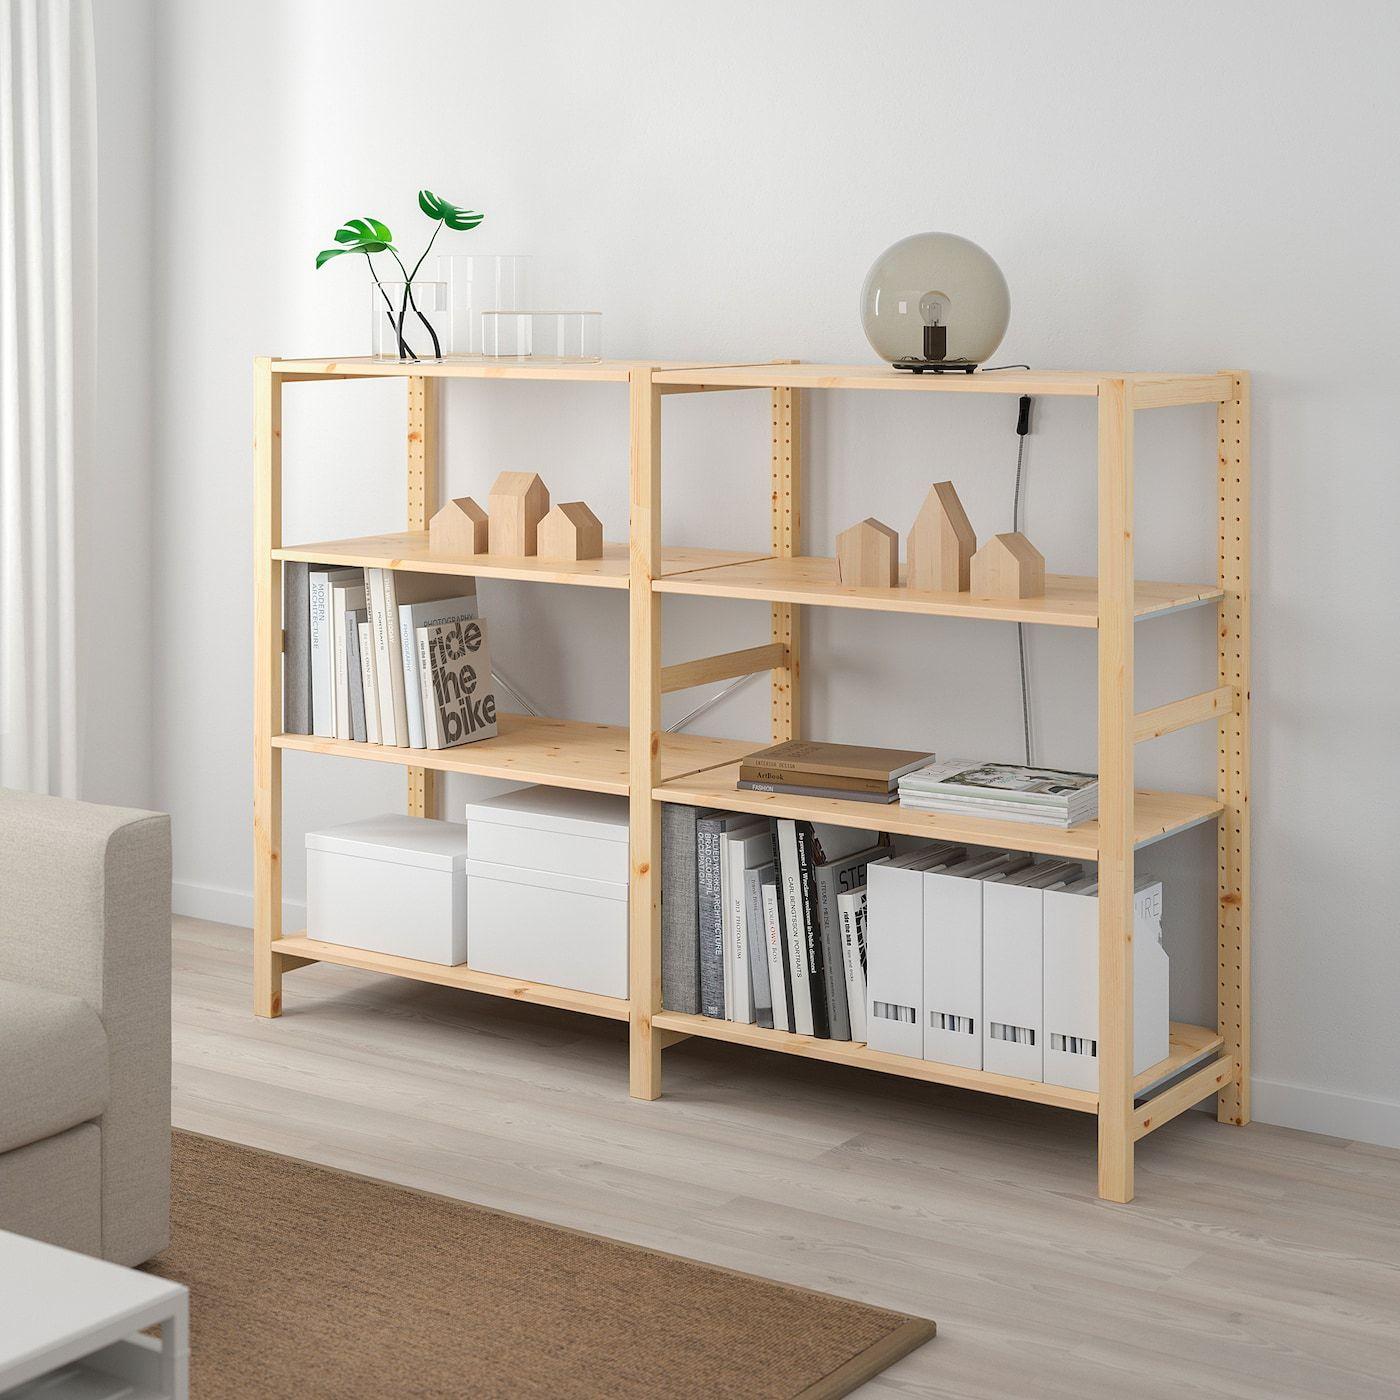 Ivar 2 Section Shelving Unit Pine 68 1 2x19 5 8x48 7 8 In 2020 Shelving Unit Shelves Ikea Ivar